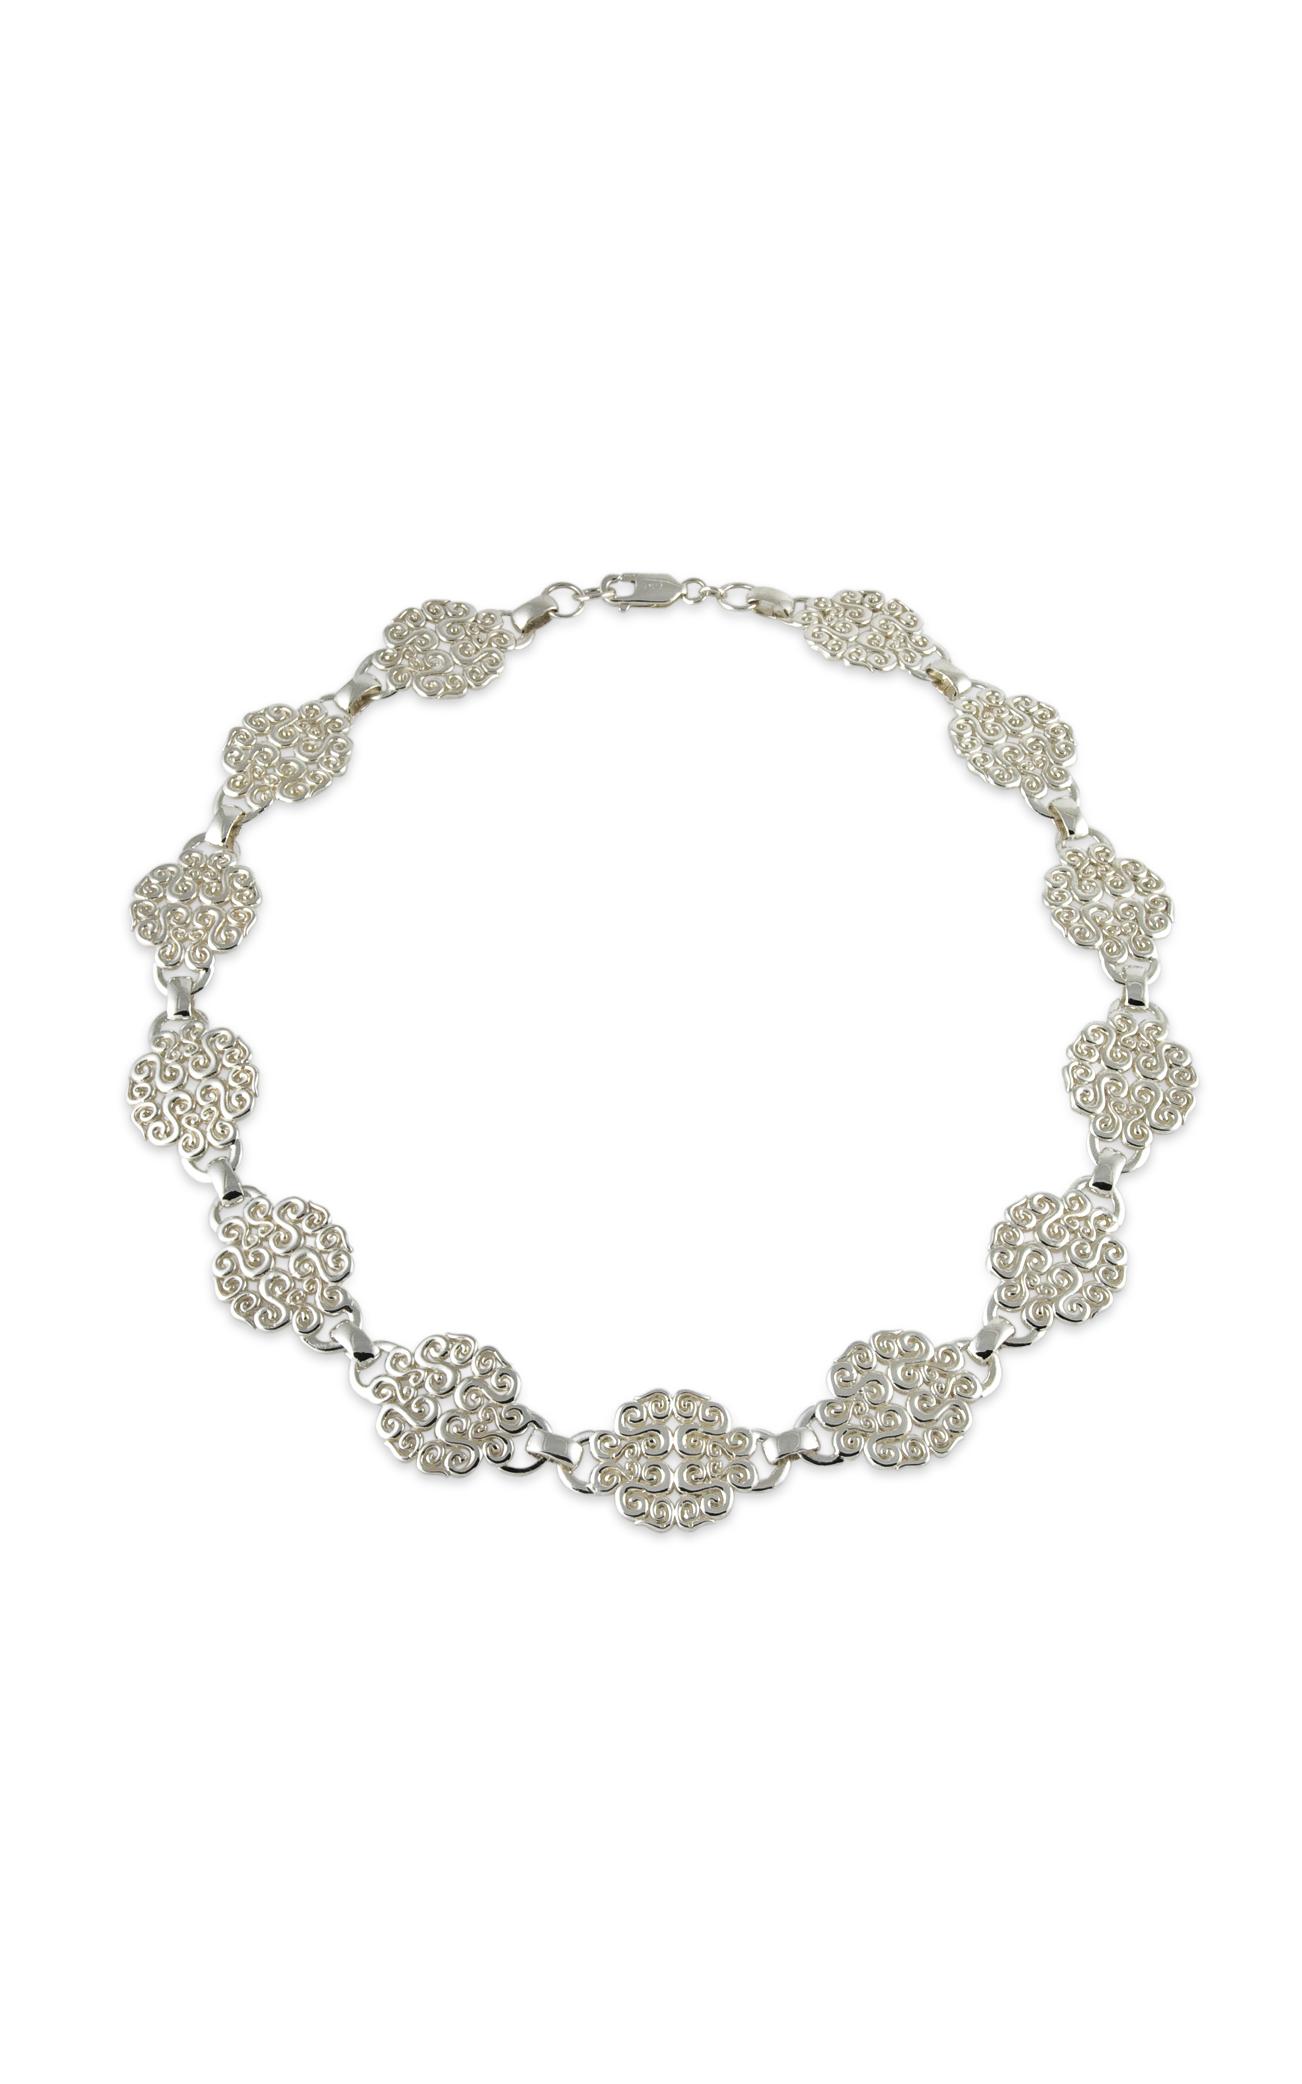 Zina Spiralz Necklace A2260-17 product image